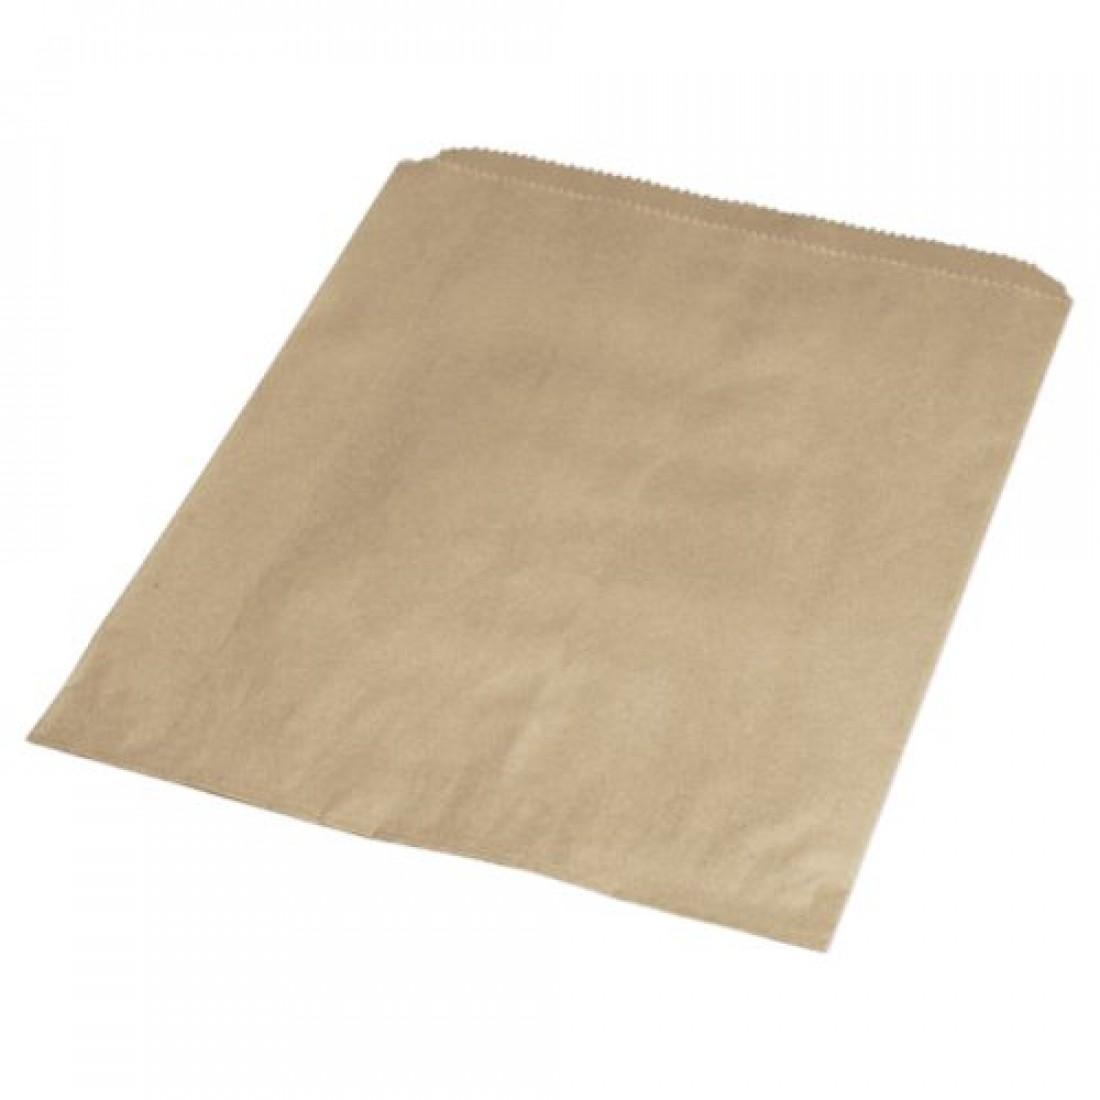 Kraft Paper Bag 6.25x9.25